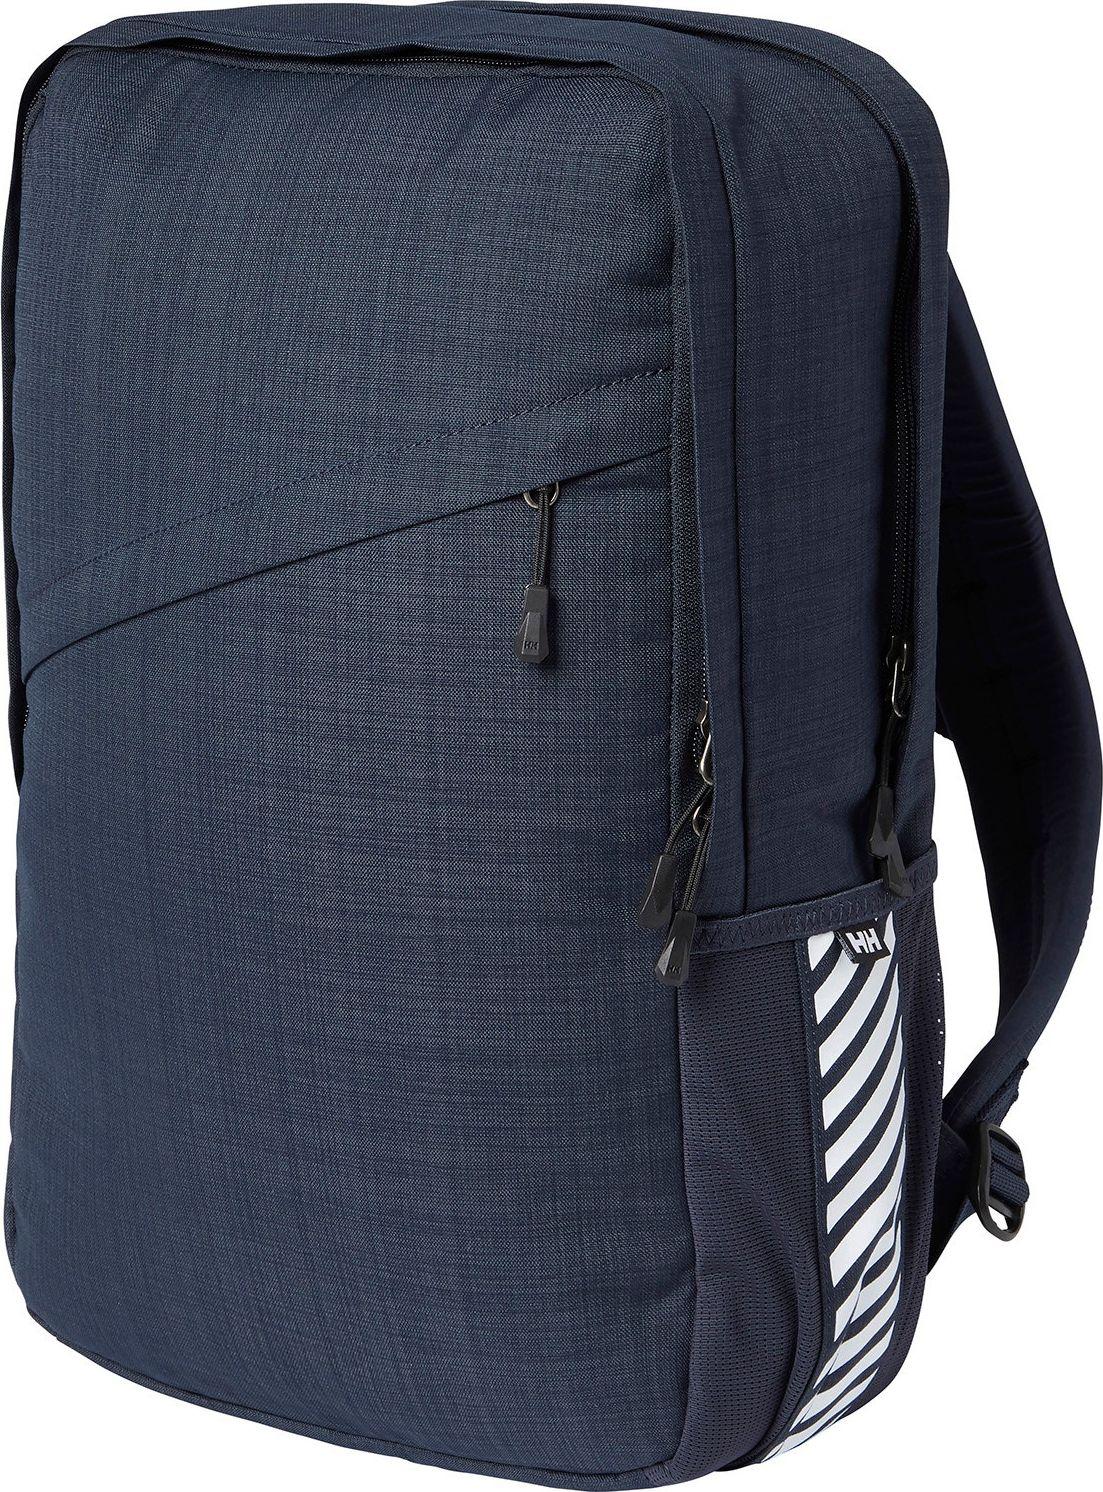 HELLY HANSEN Sentrum Backpack Navy One size